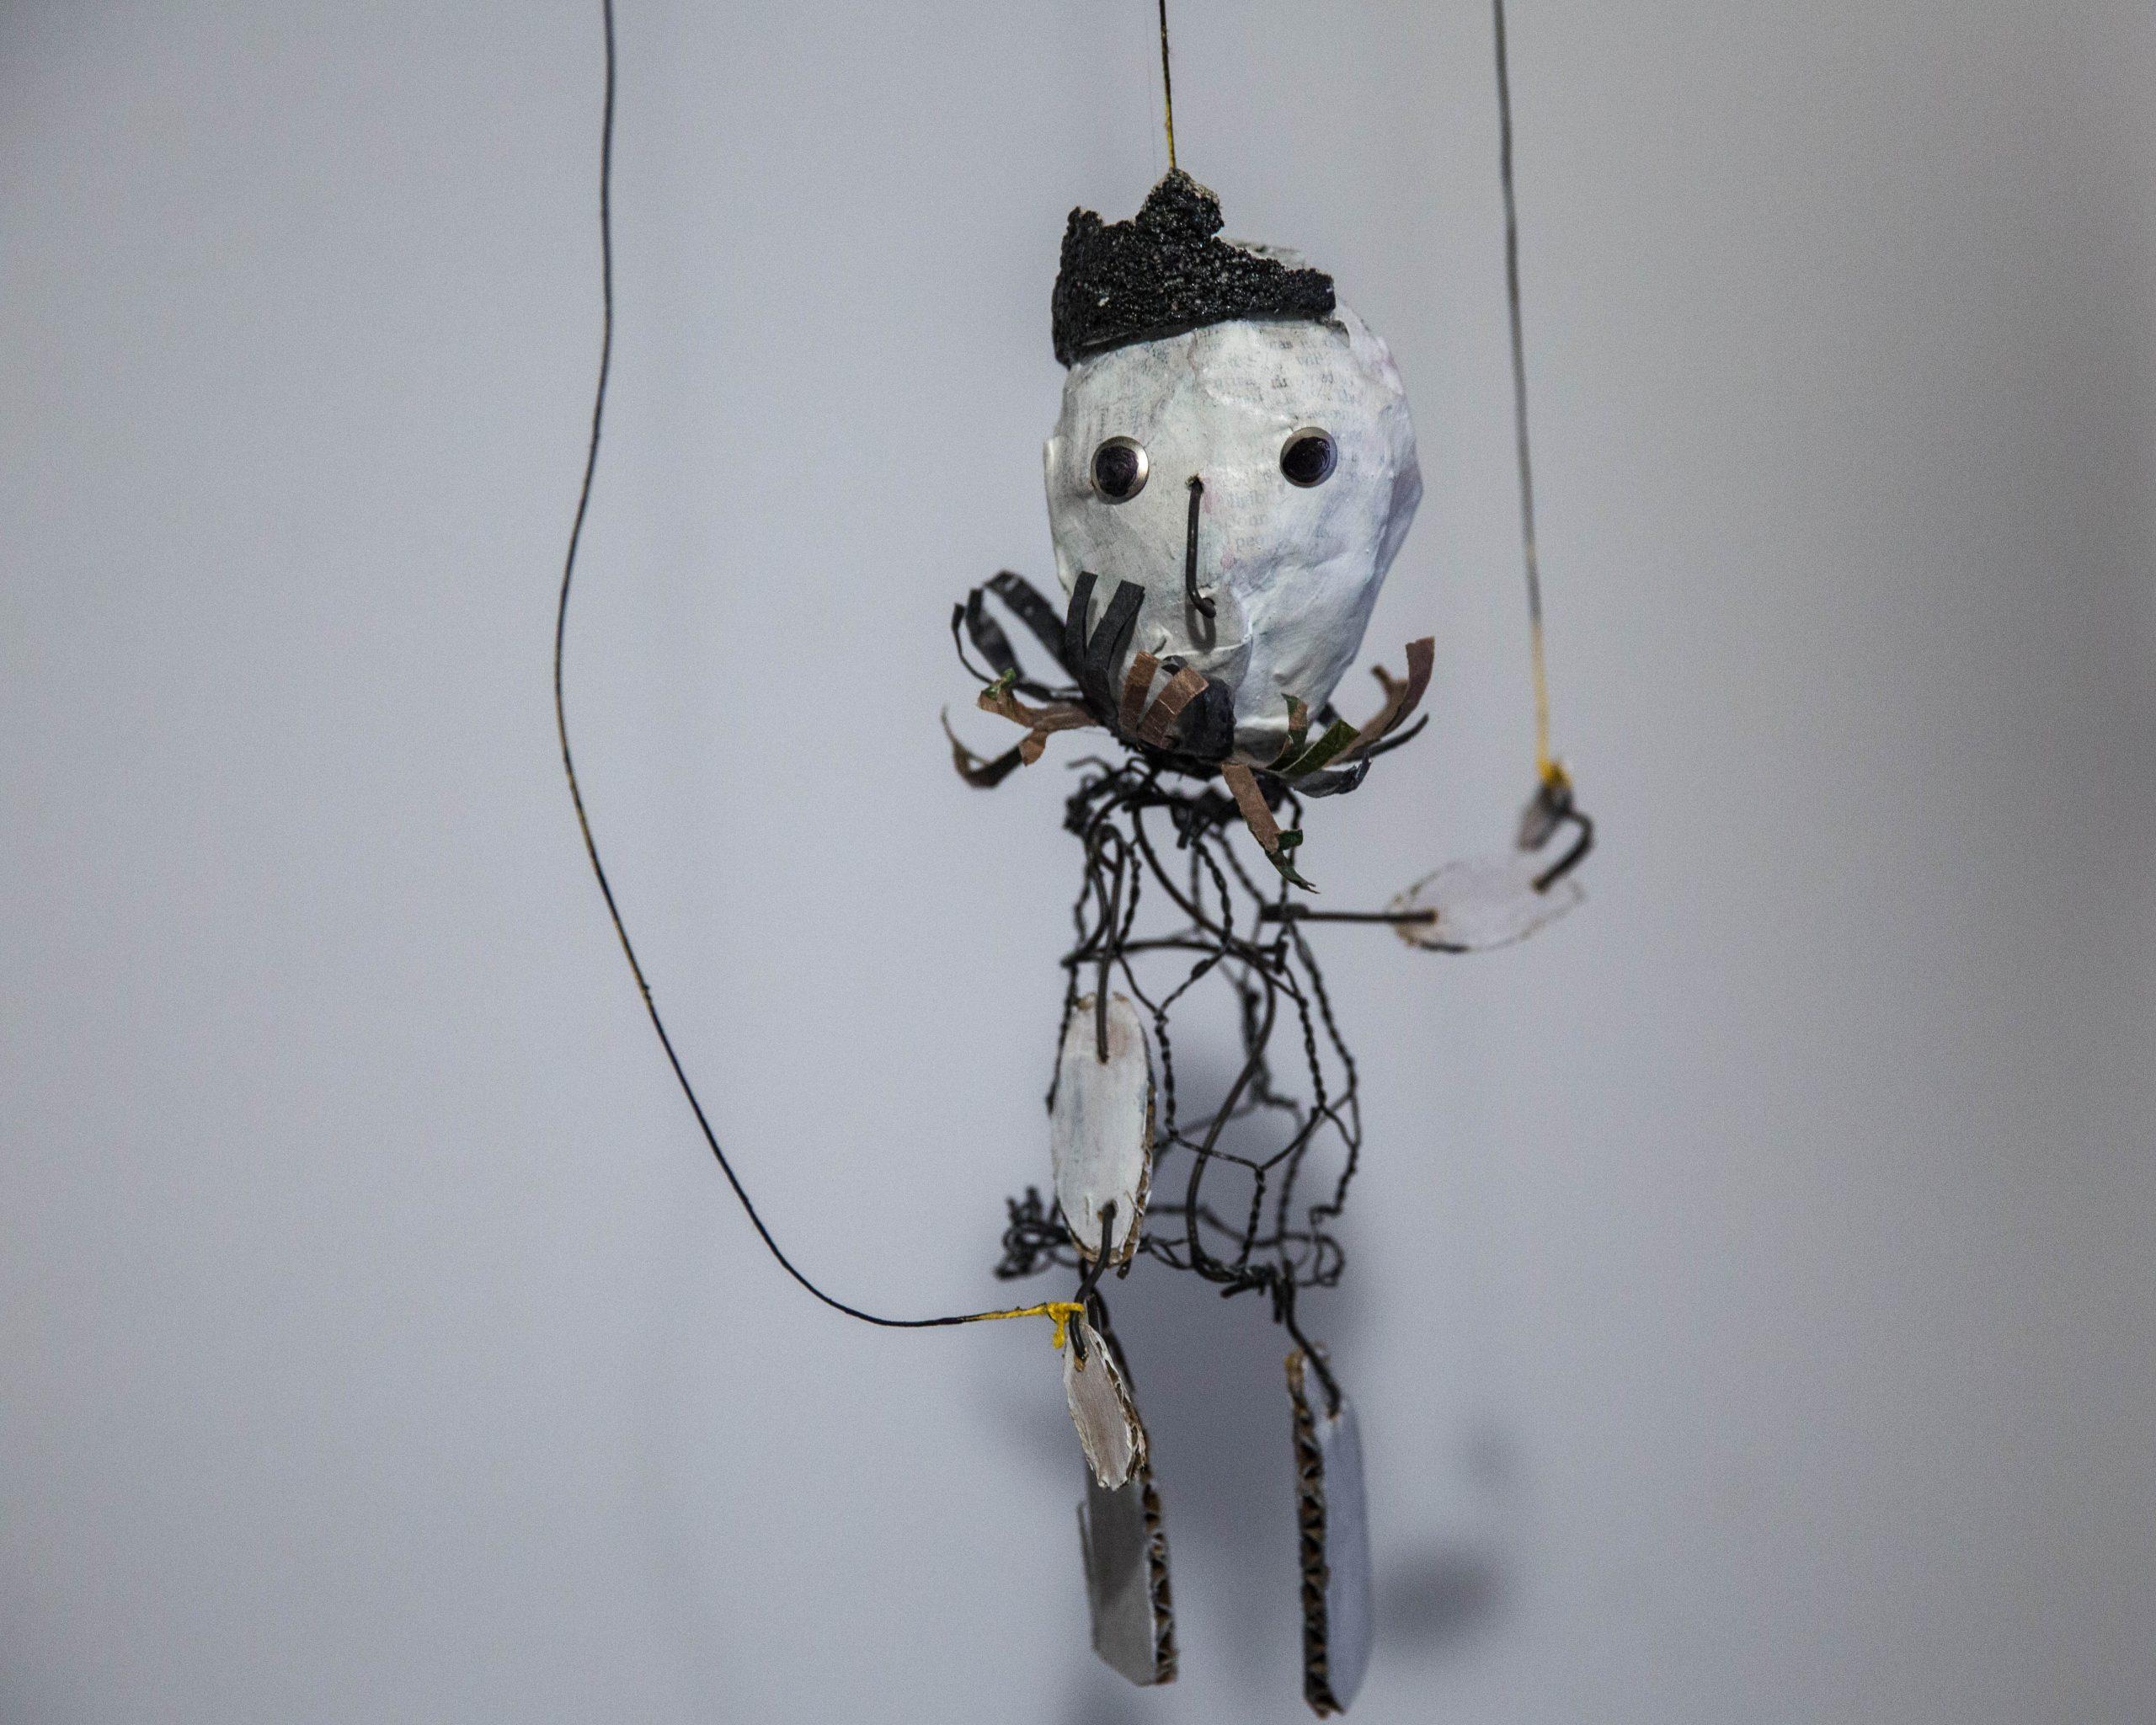 King George, 2014, Paper mache, styrofoam, wire, paint brush, string, cardboard, plastic bags